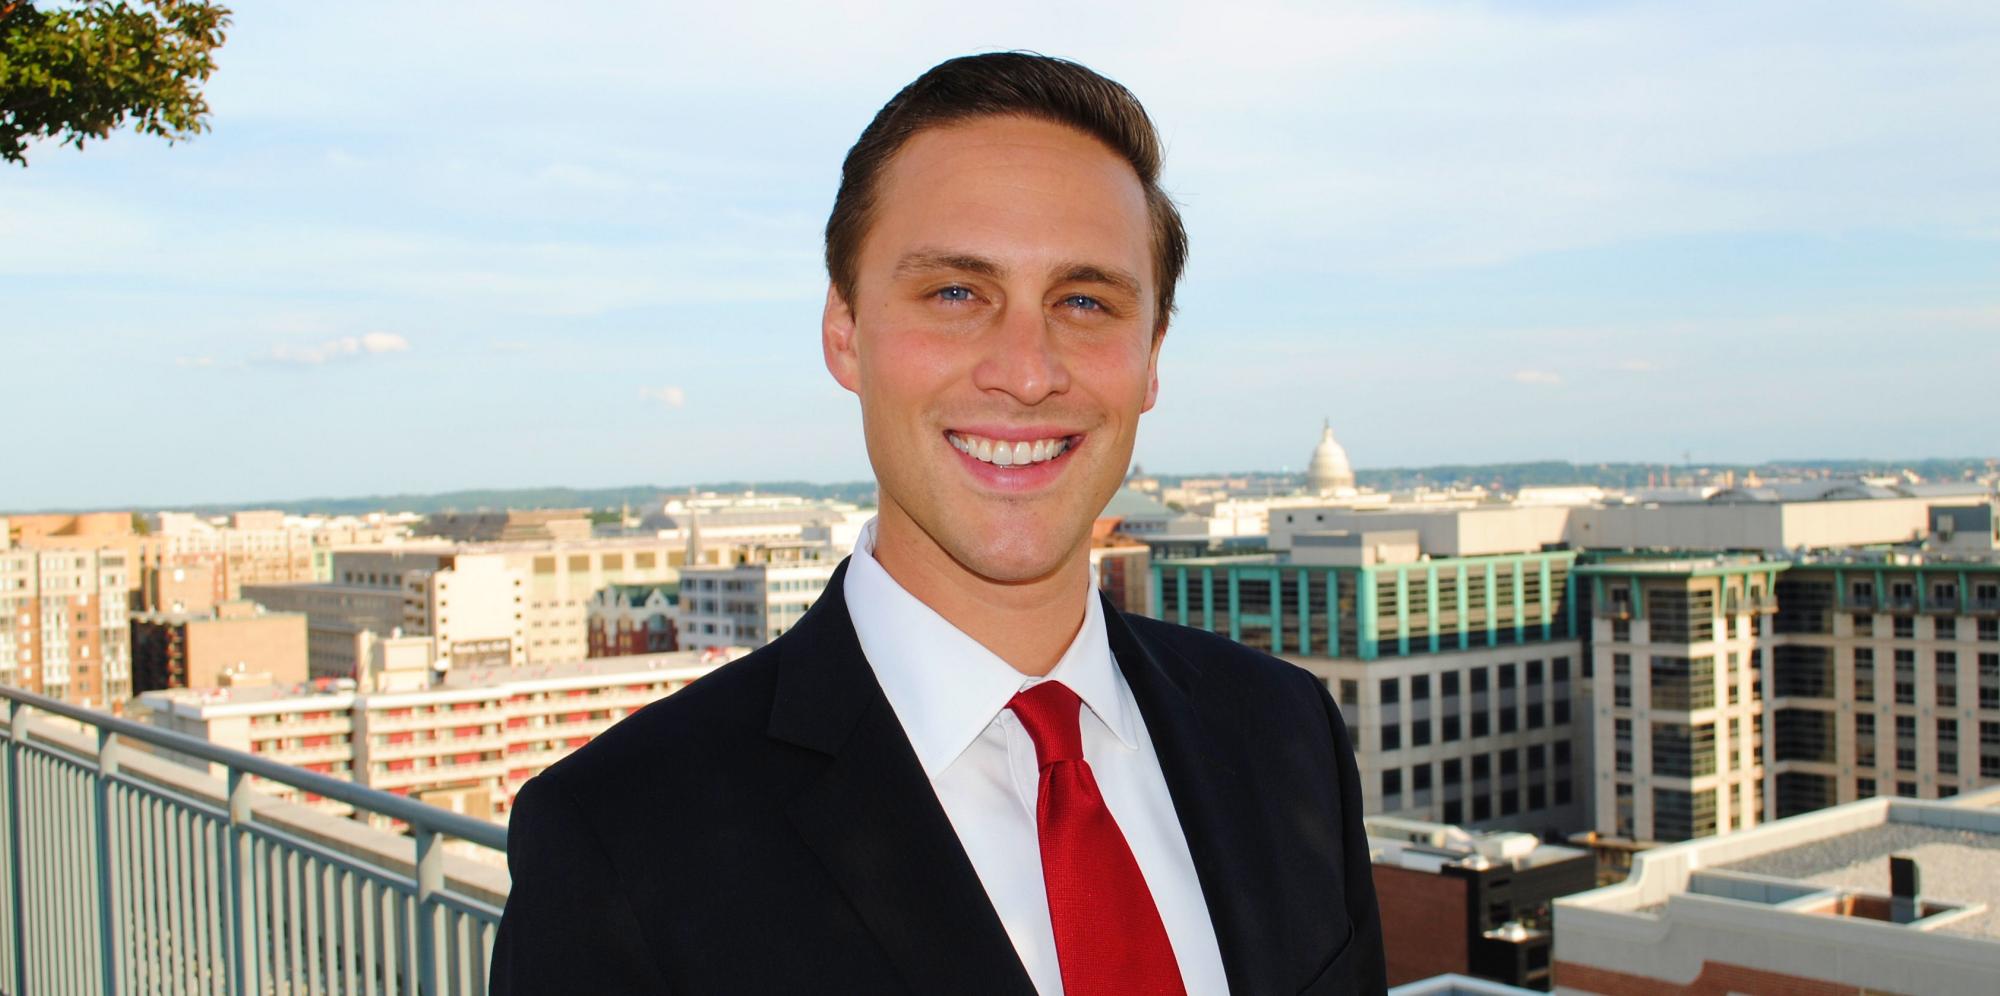 Alexander-Johnstone-Founder-CEO-World-Advisory